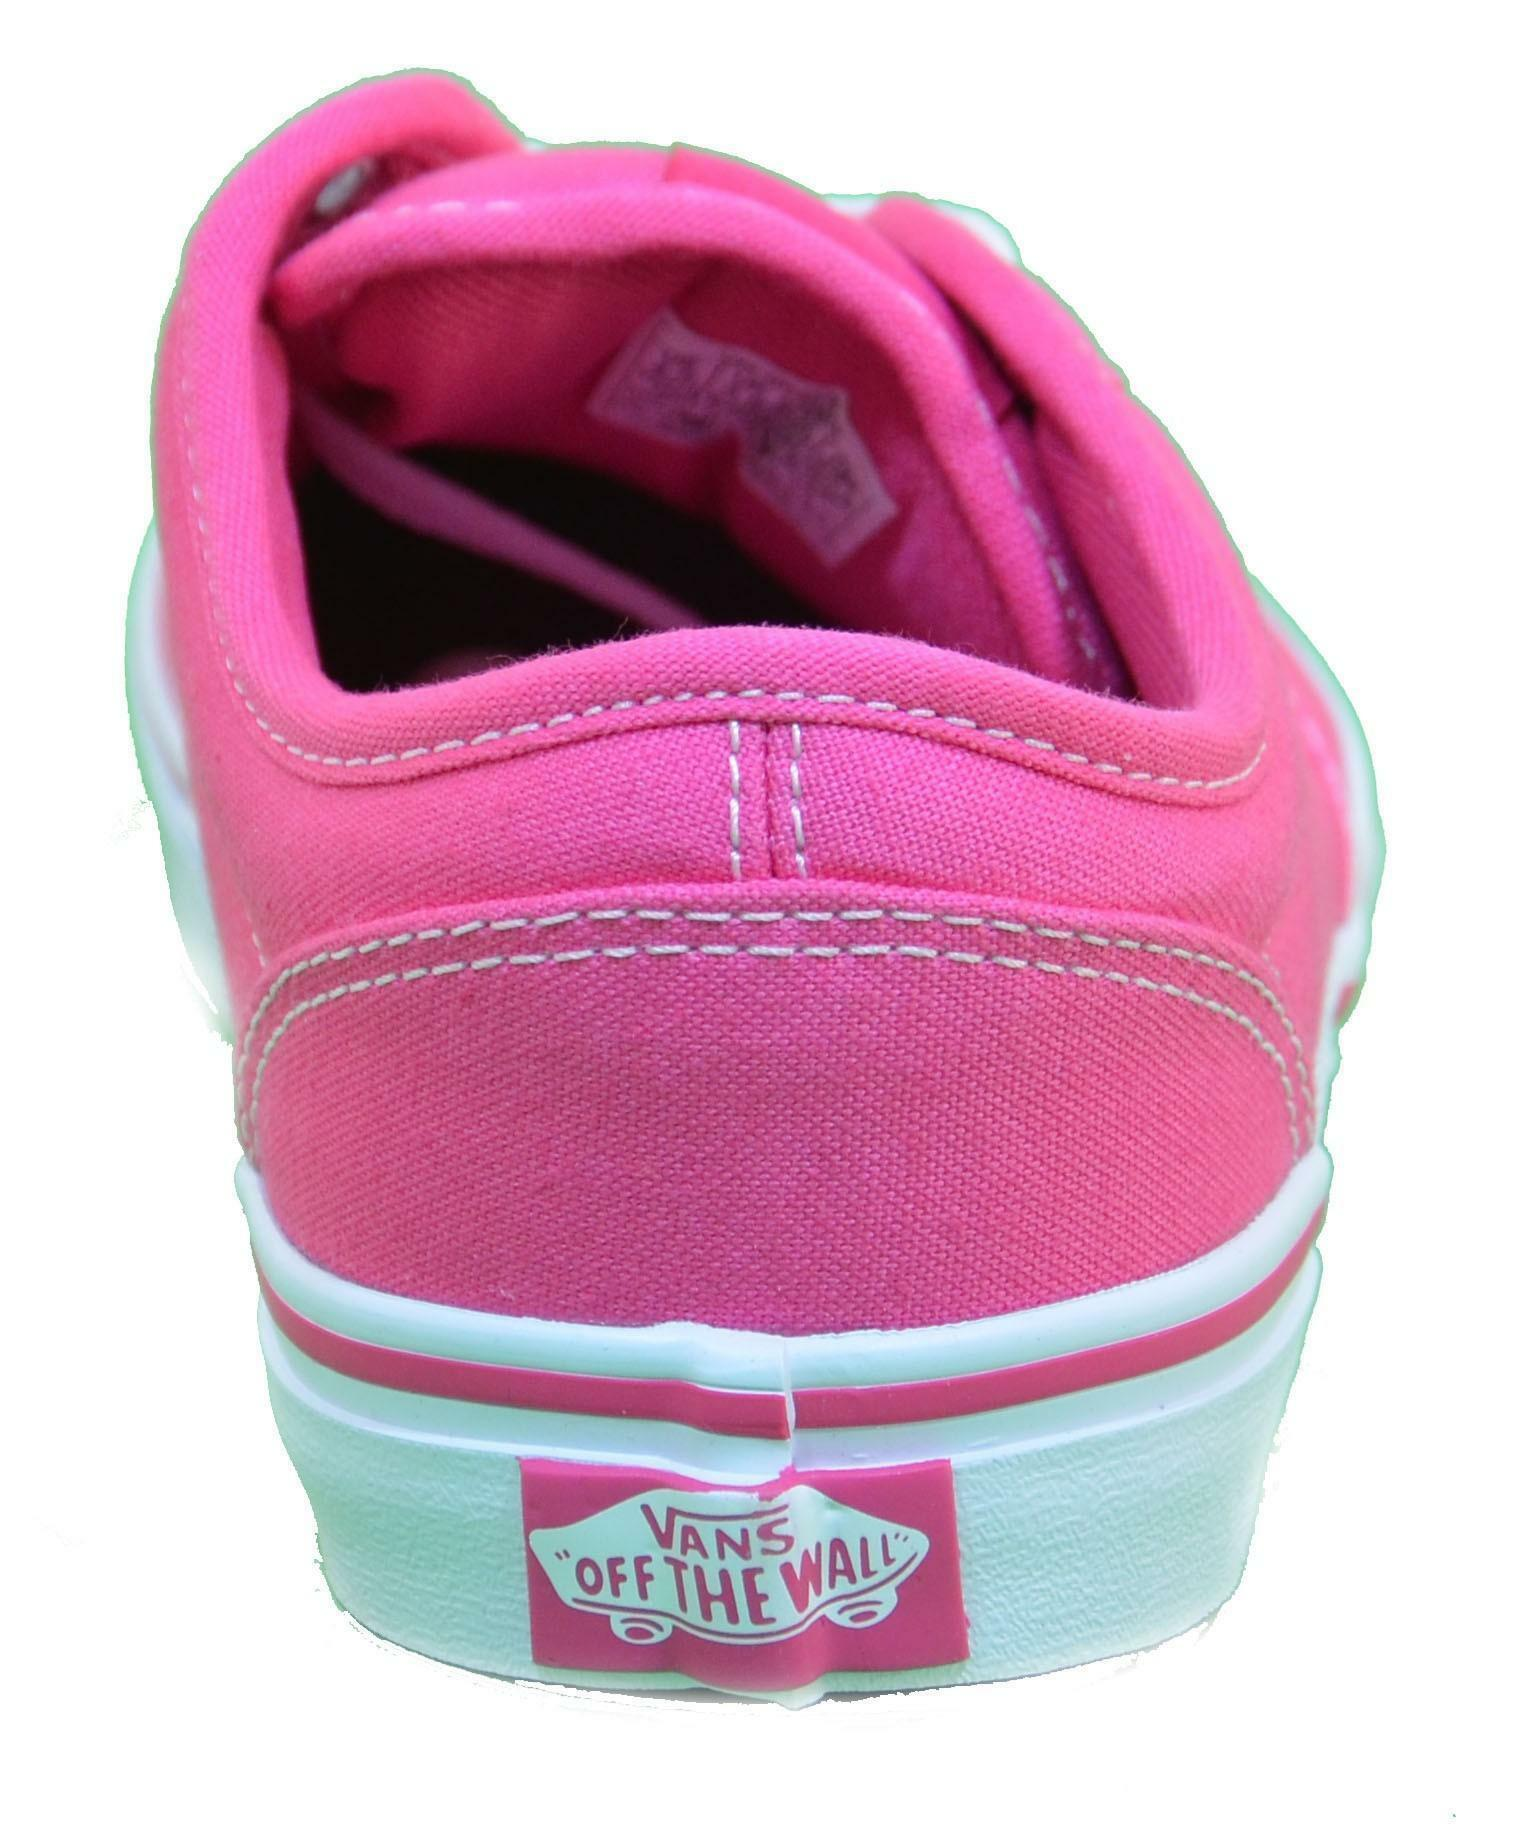 vans vans atwood scarpe donna fucsia tela k2u8ix